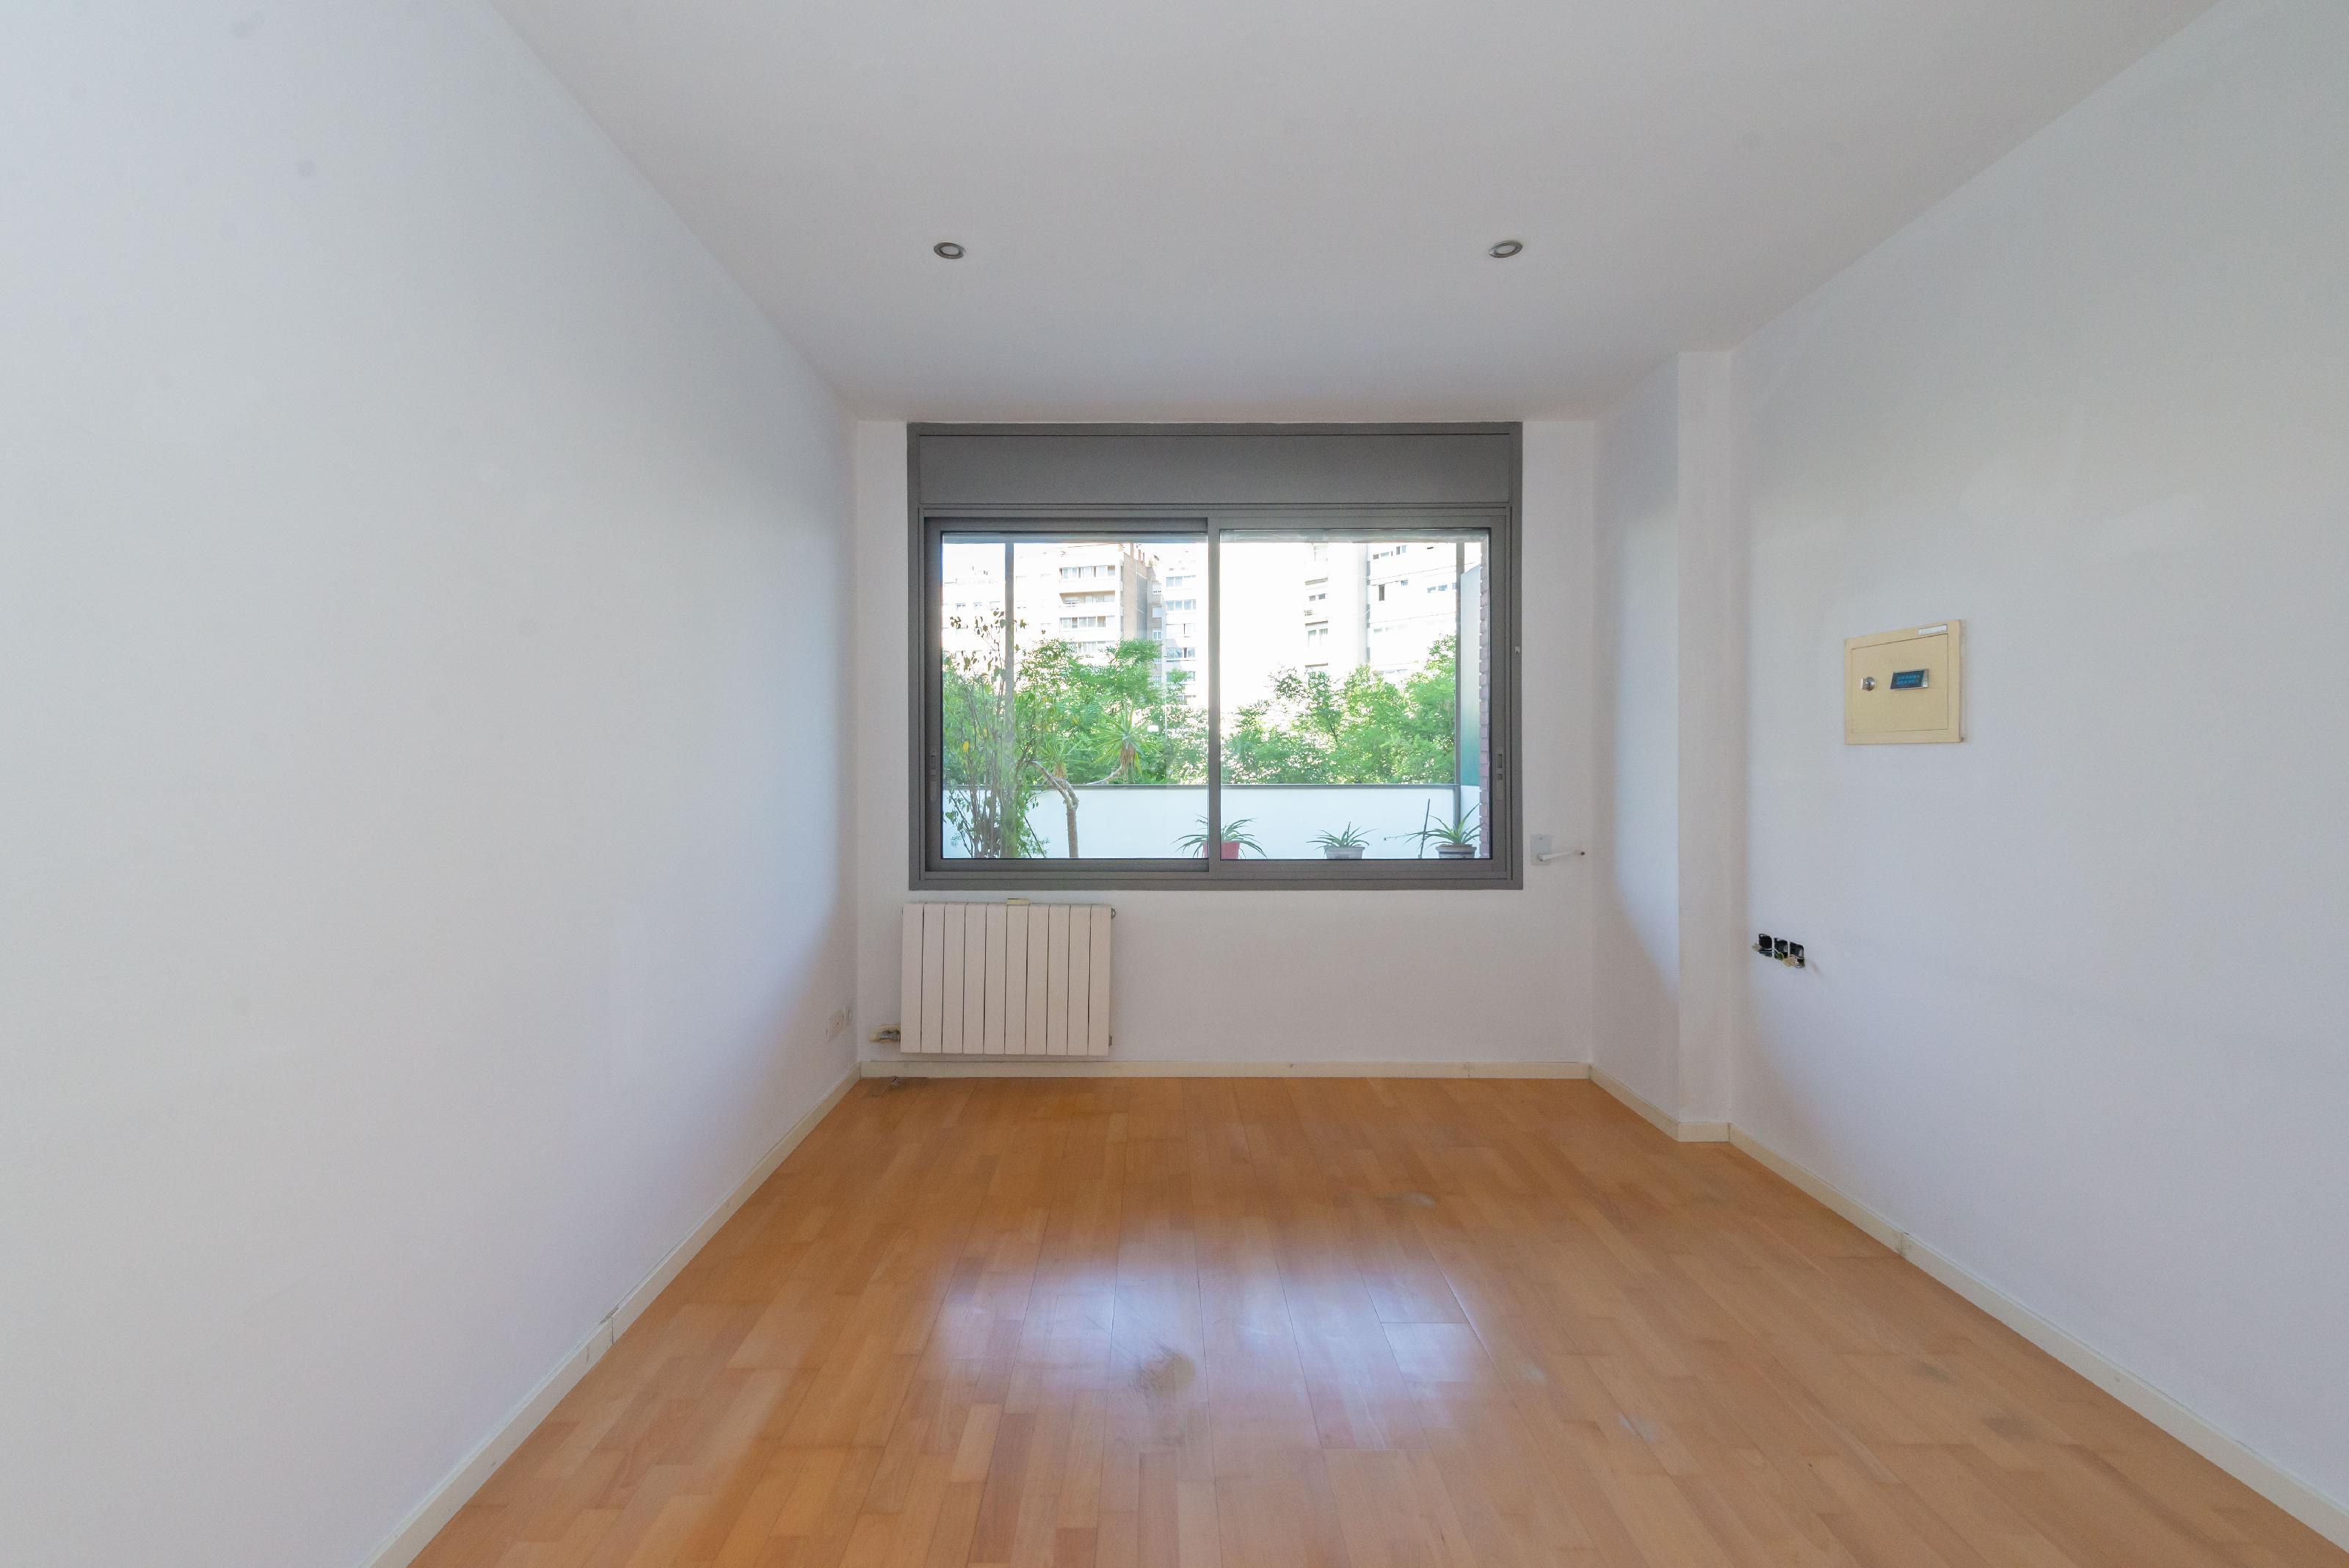 251446 Flat for sale in Sarrià-Sant Gervasi, Tres Torres 5